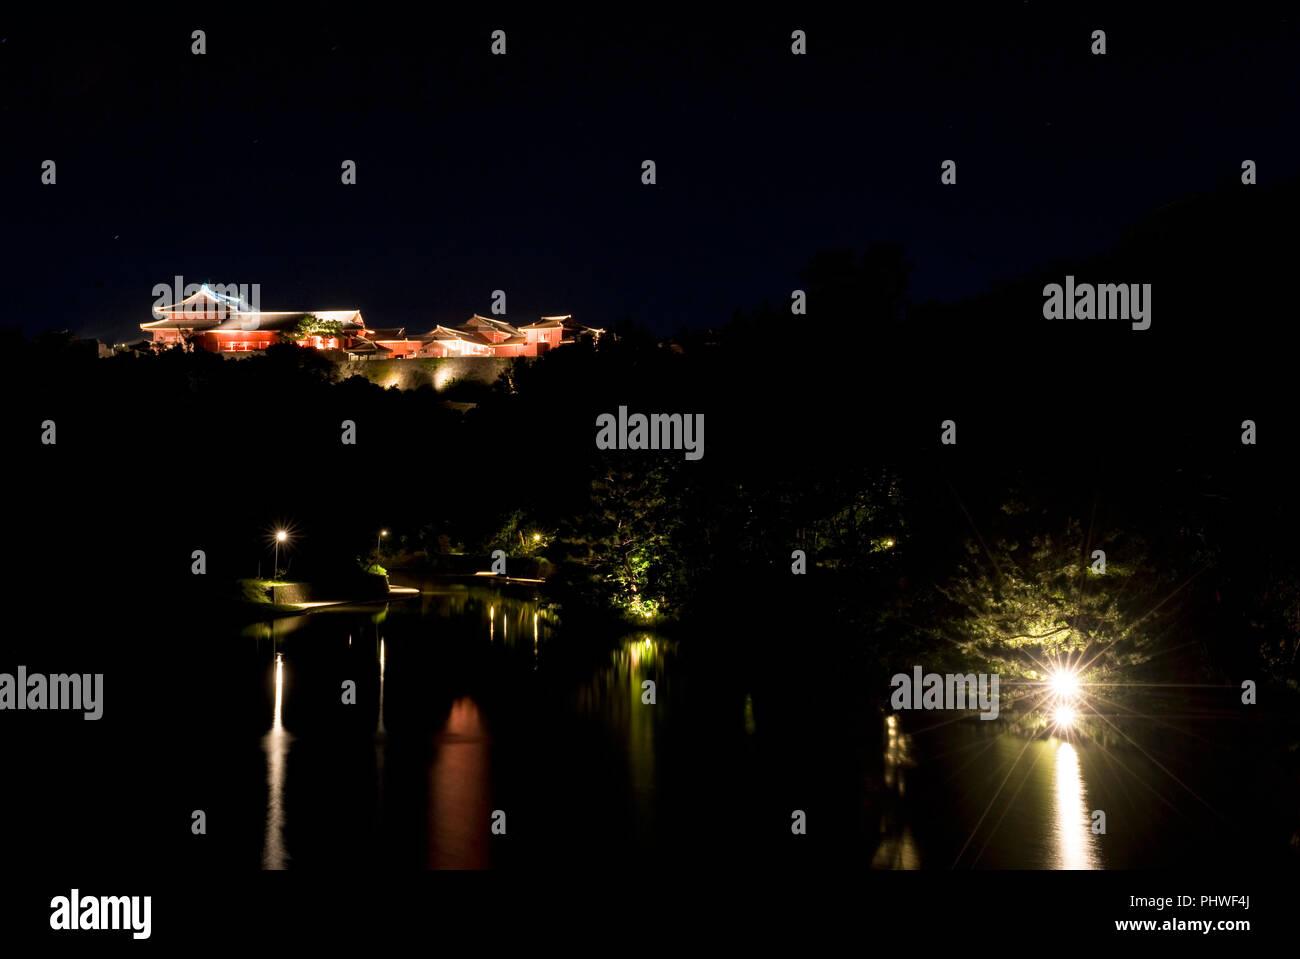 Photo shows Shuri Castle illuminated at night in Naha, Okinawa Prefecture, Japan, on June 24, 2012. Photographer: Robert Gilhooly - Stock Image